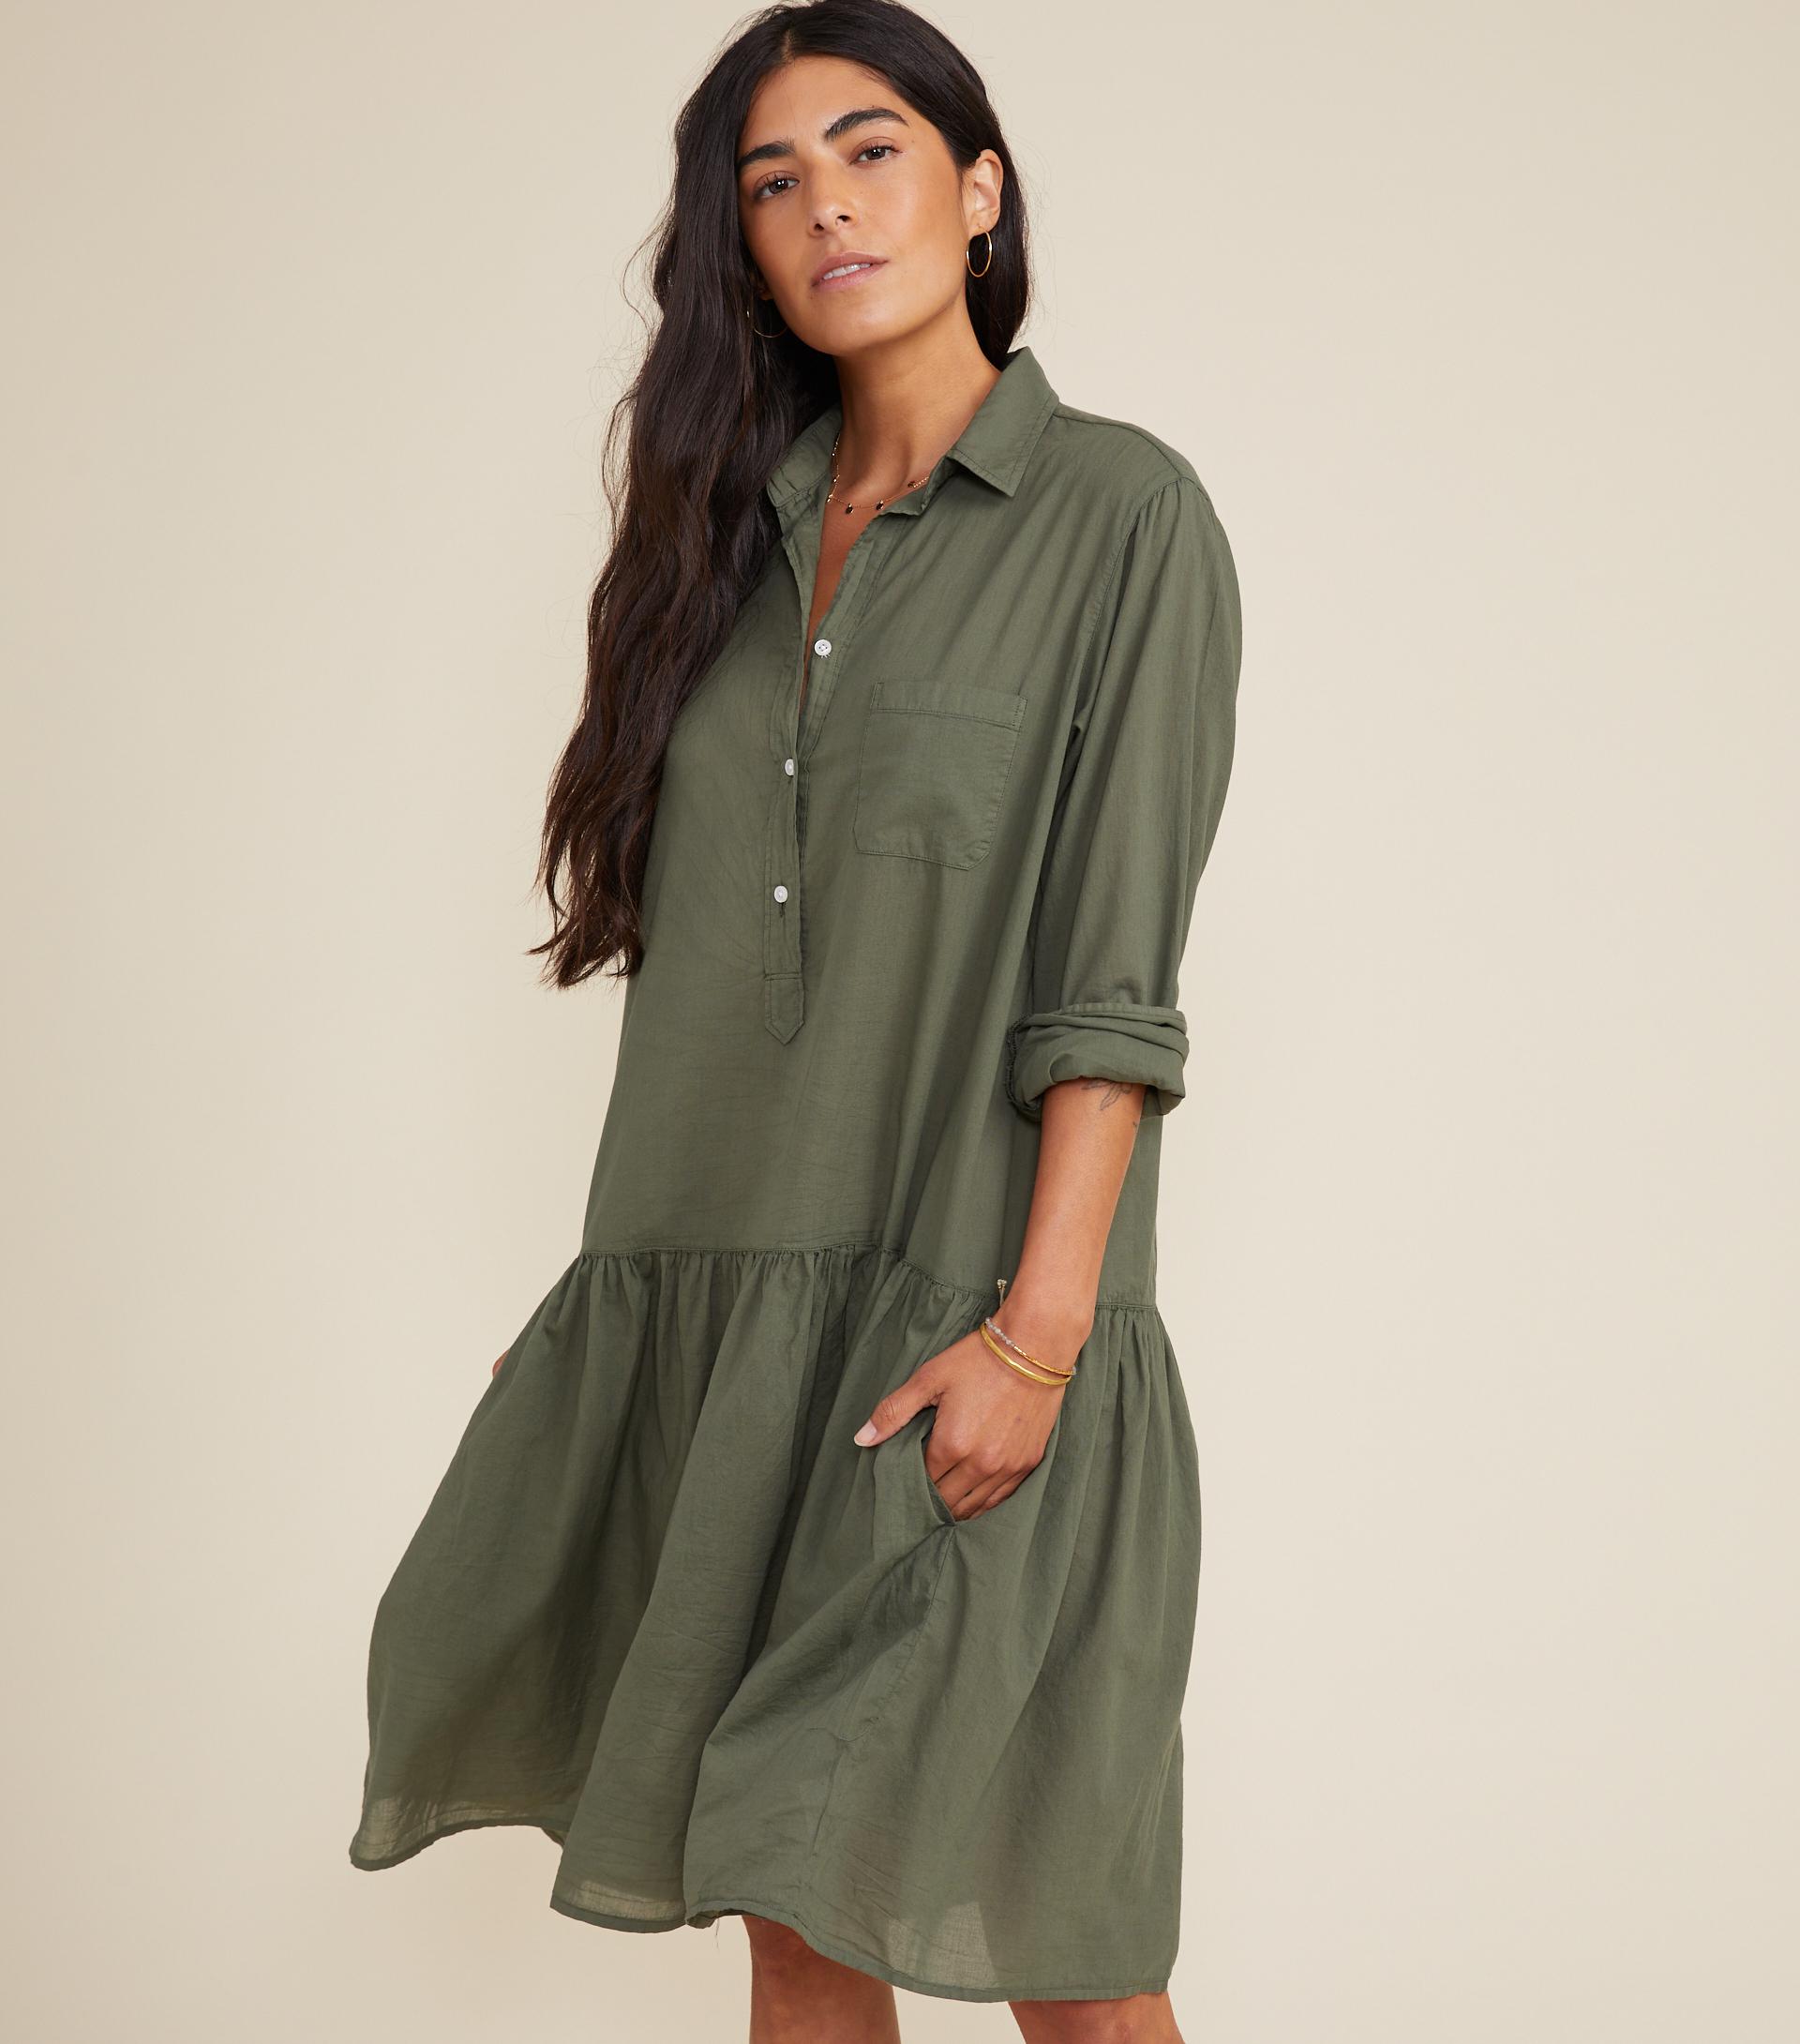 The Changemaker Dress Army Green, Tissue Cotton view 1